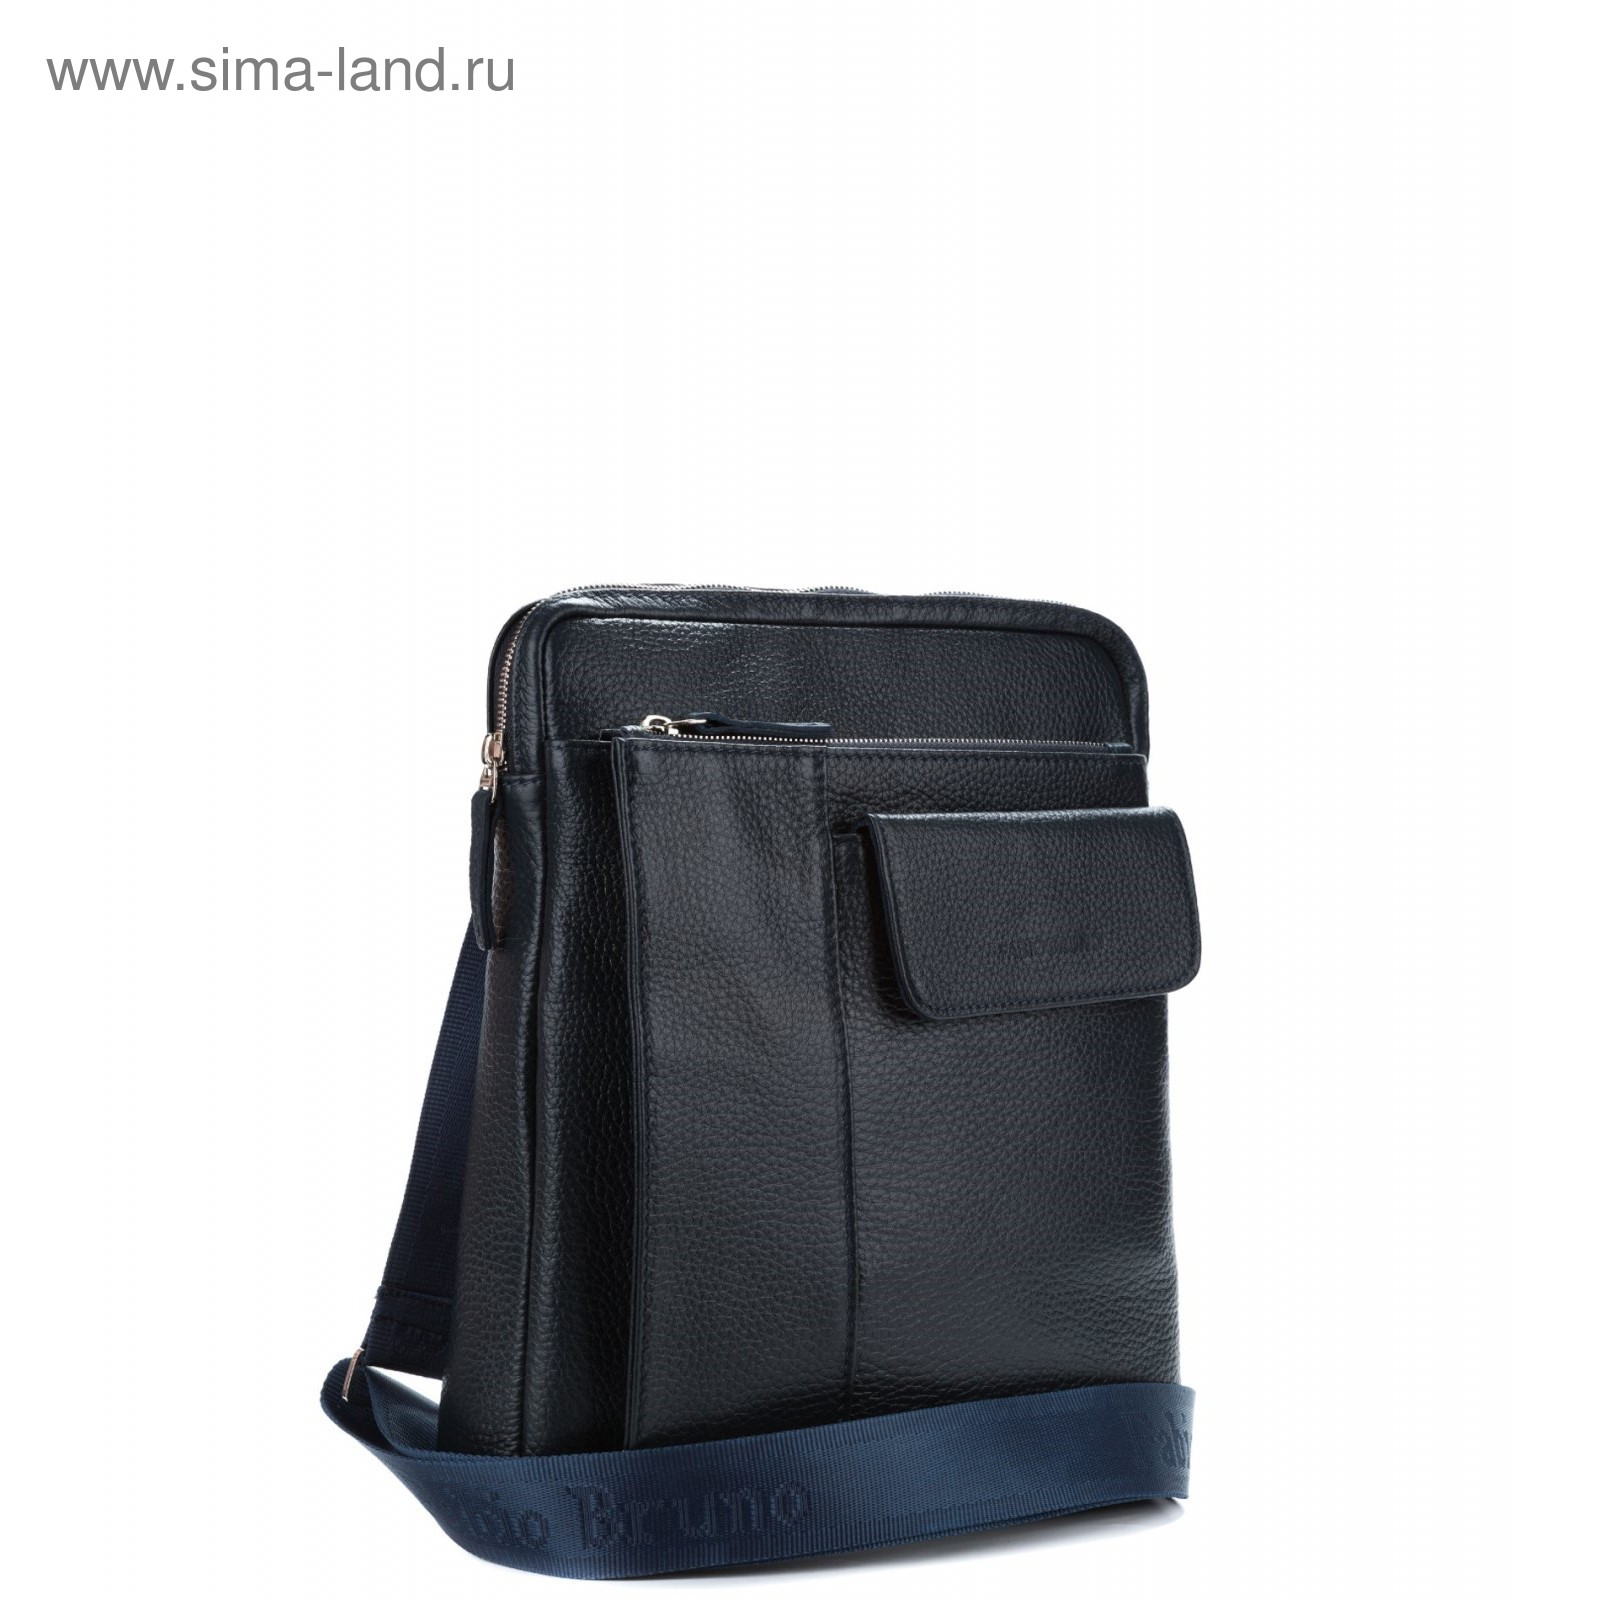 638301d24167 Мужская сумка кросс-боди FABIO BRUNO RM-303 D тёмно-синий (4282816 ...